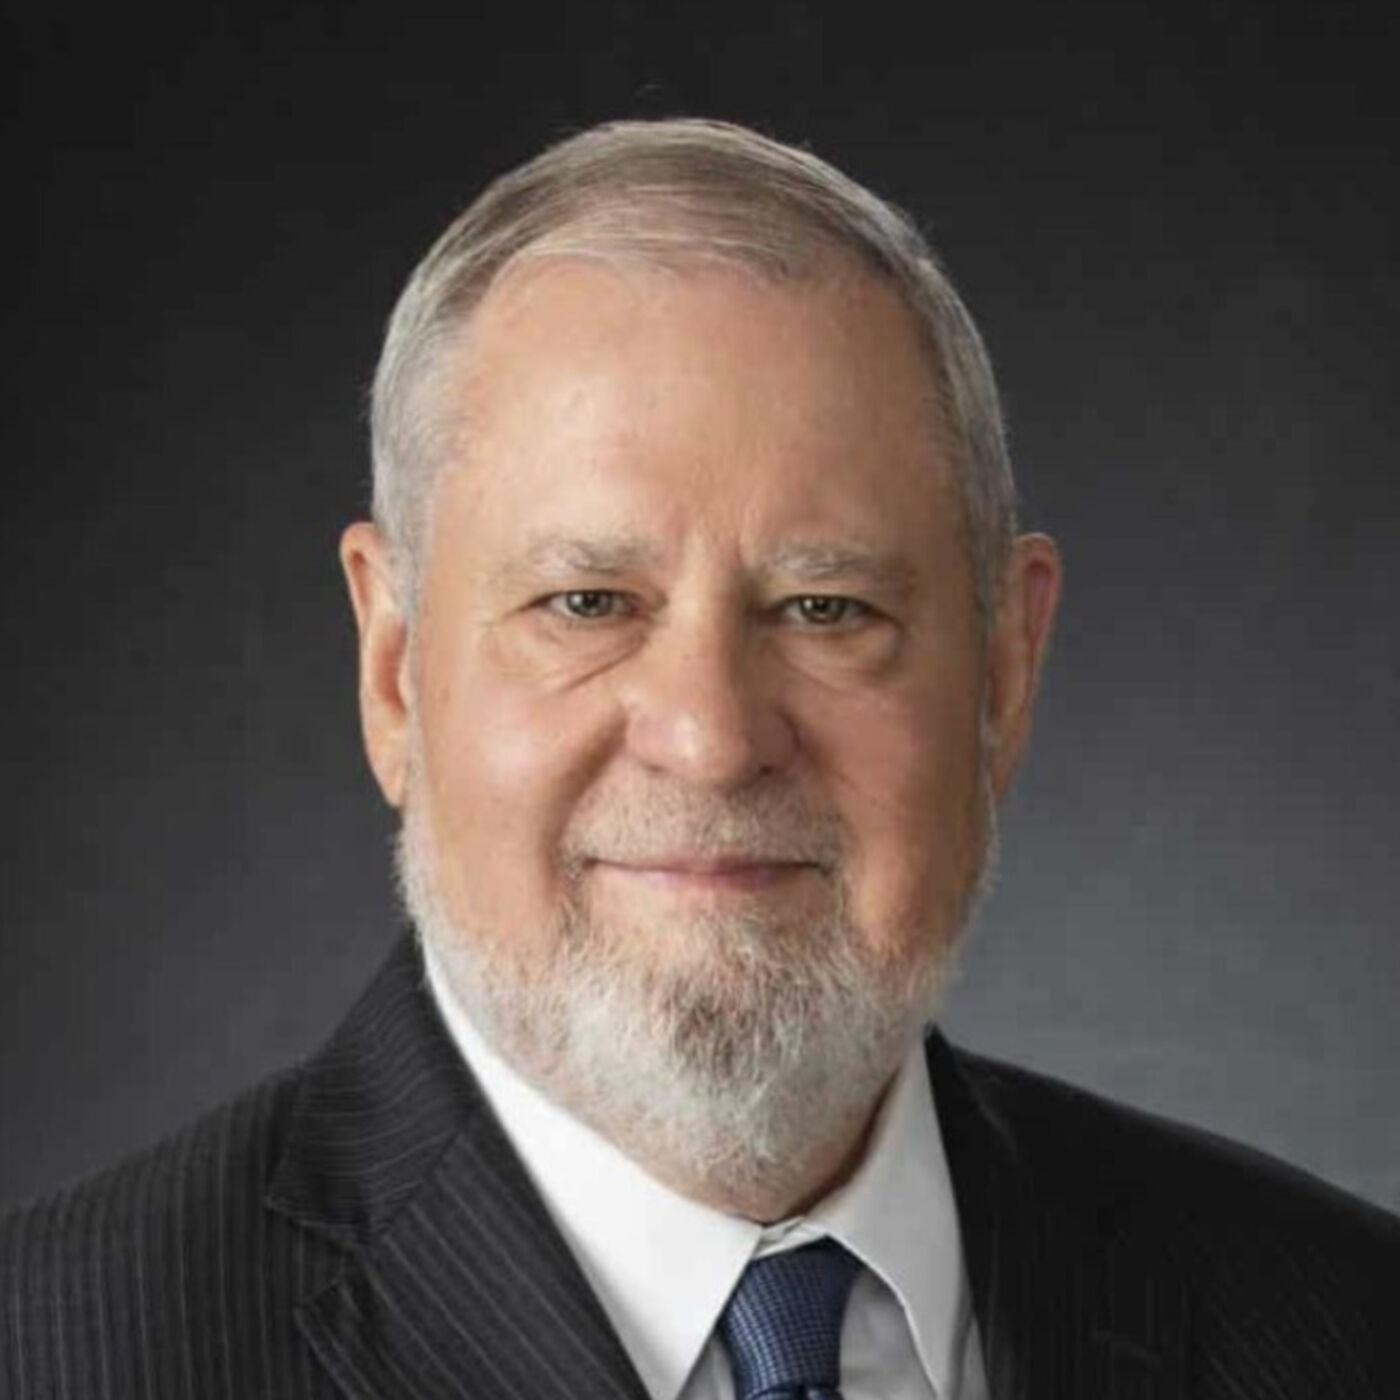 Dr. Larry Arnn, President of Hillsdale College